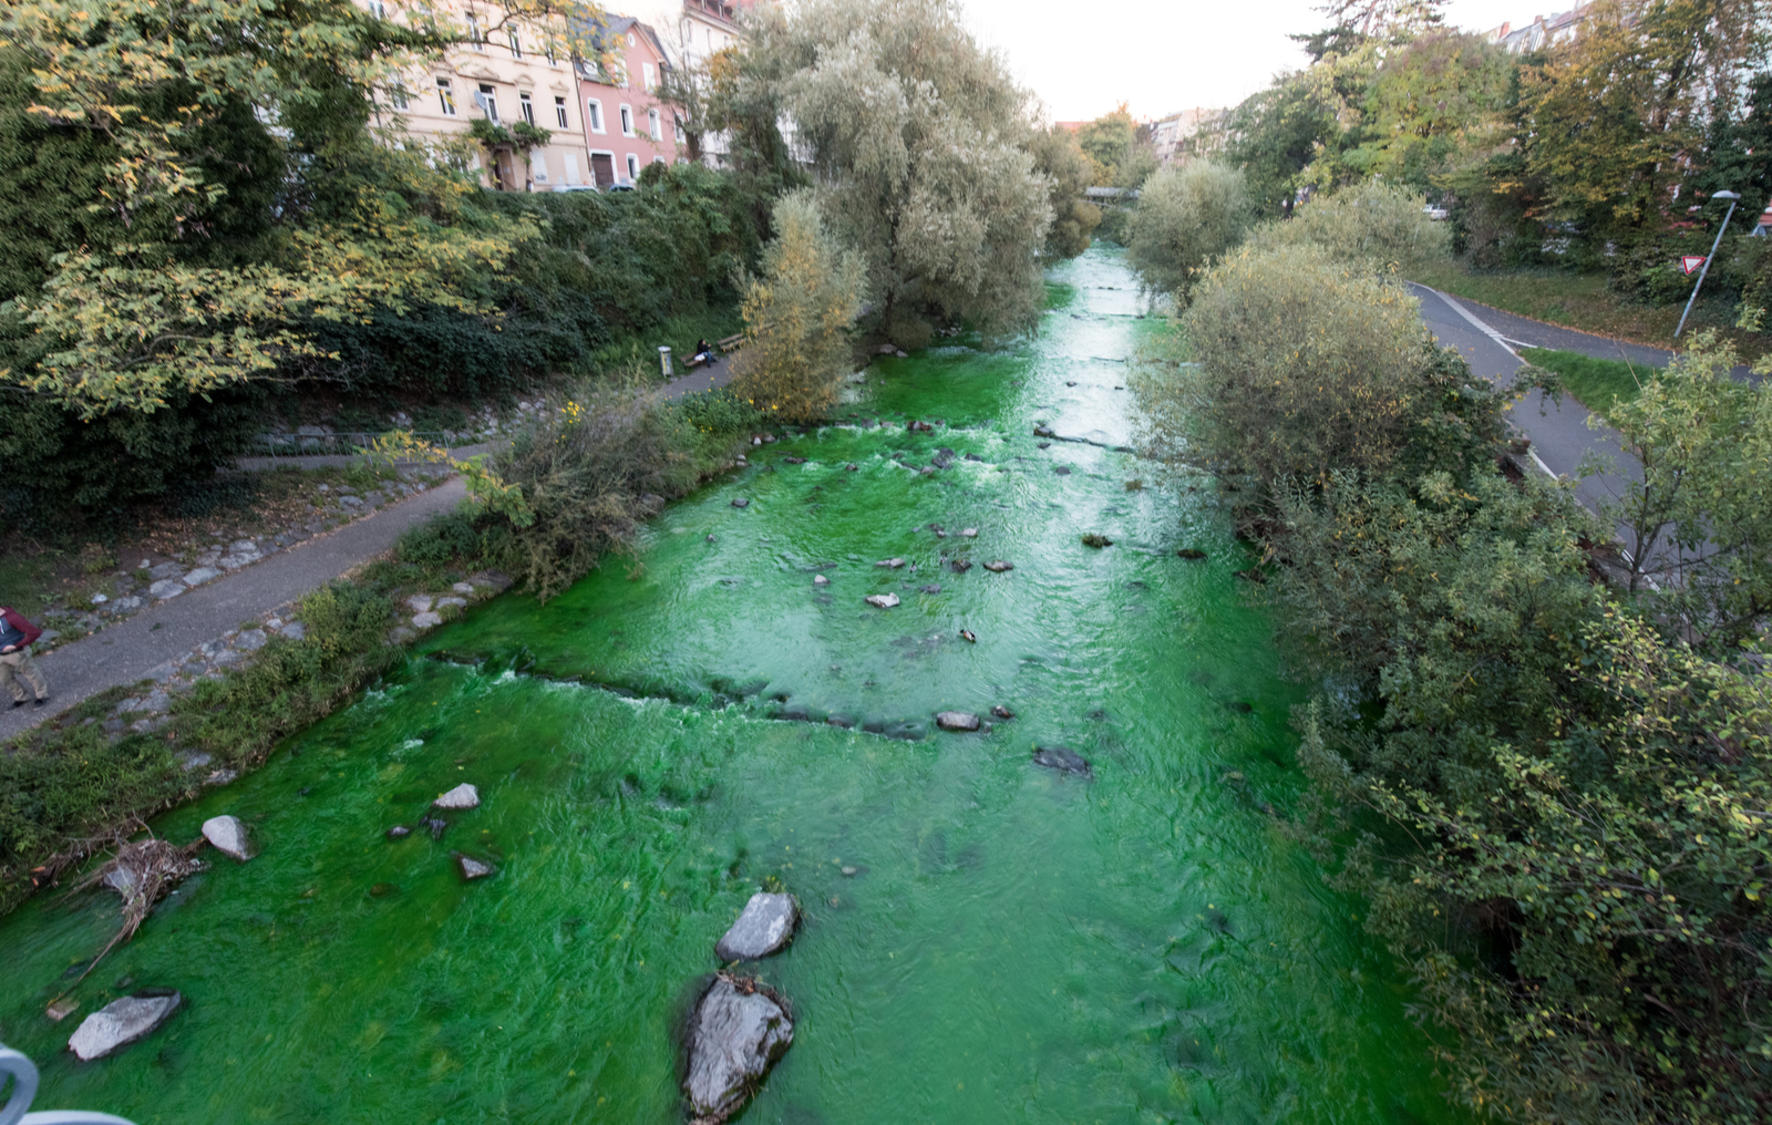 Ratsel Um Giftgrunen Fluss In Freiburg Wo Kommt Die Ganze Farbe